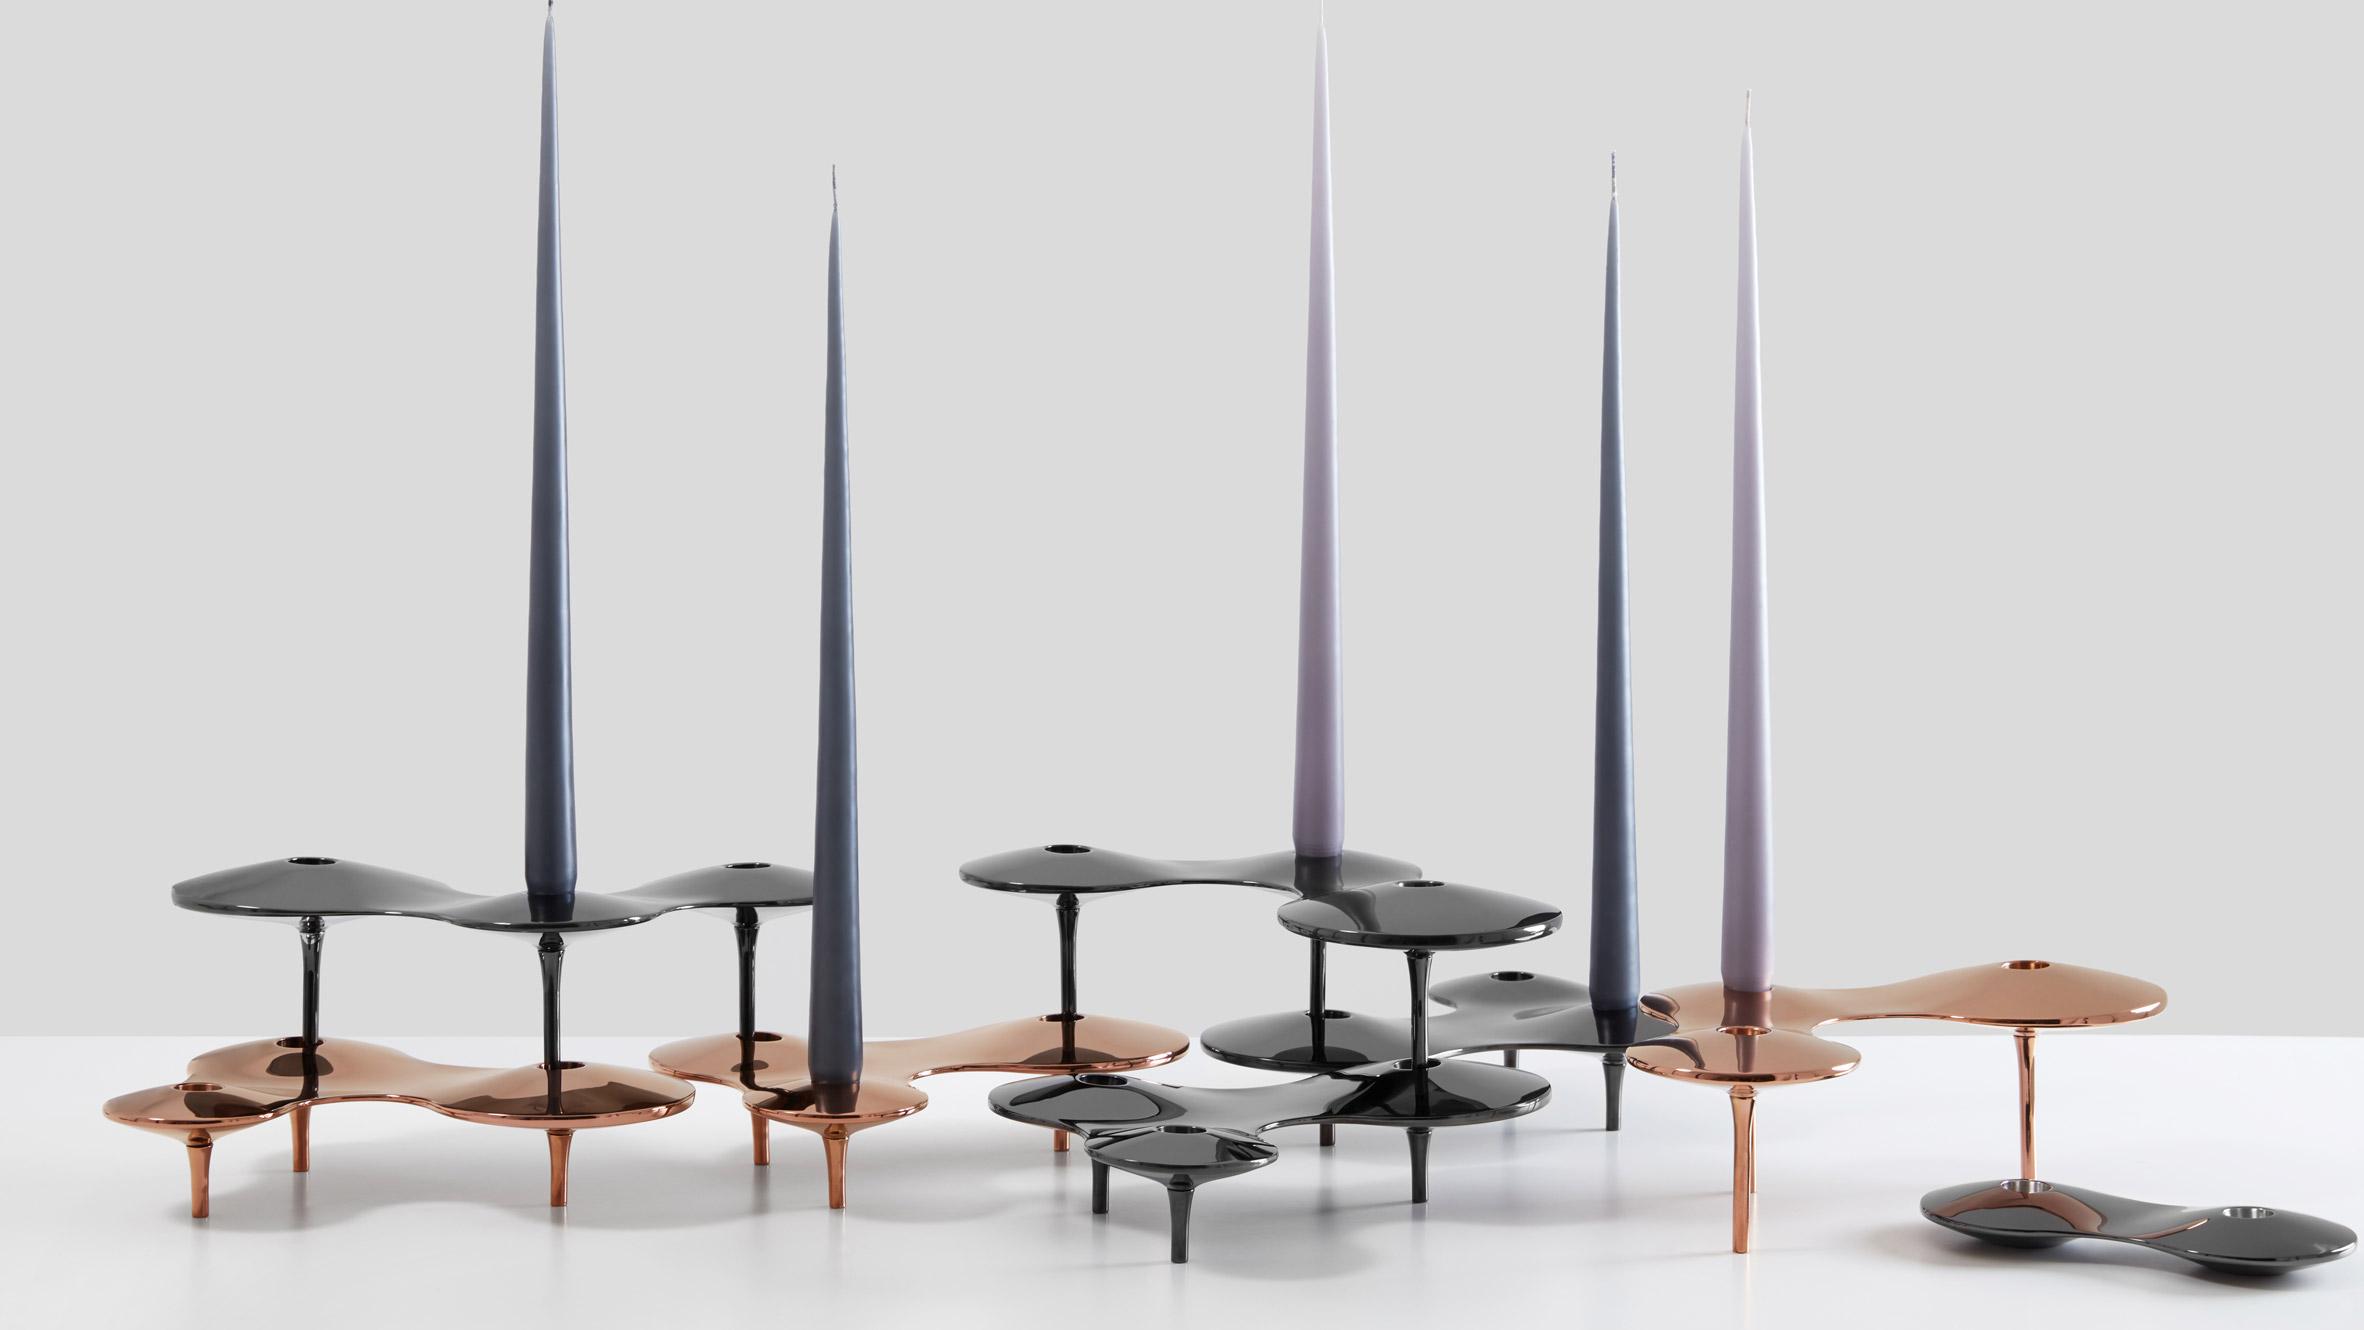 Zaha Hadid Design CELL candle holders - Photo by Zaha Hadid Design